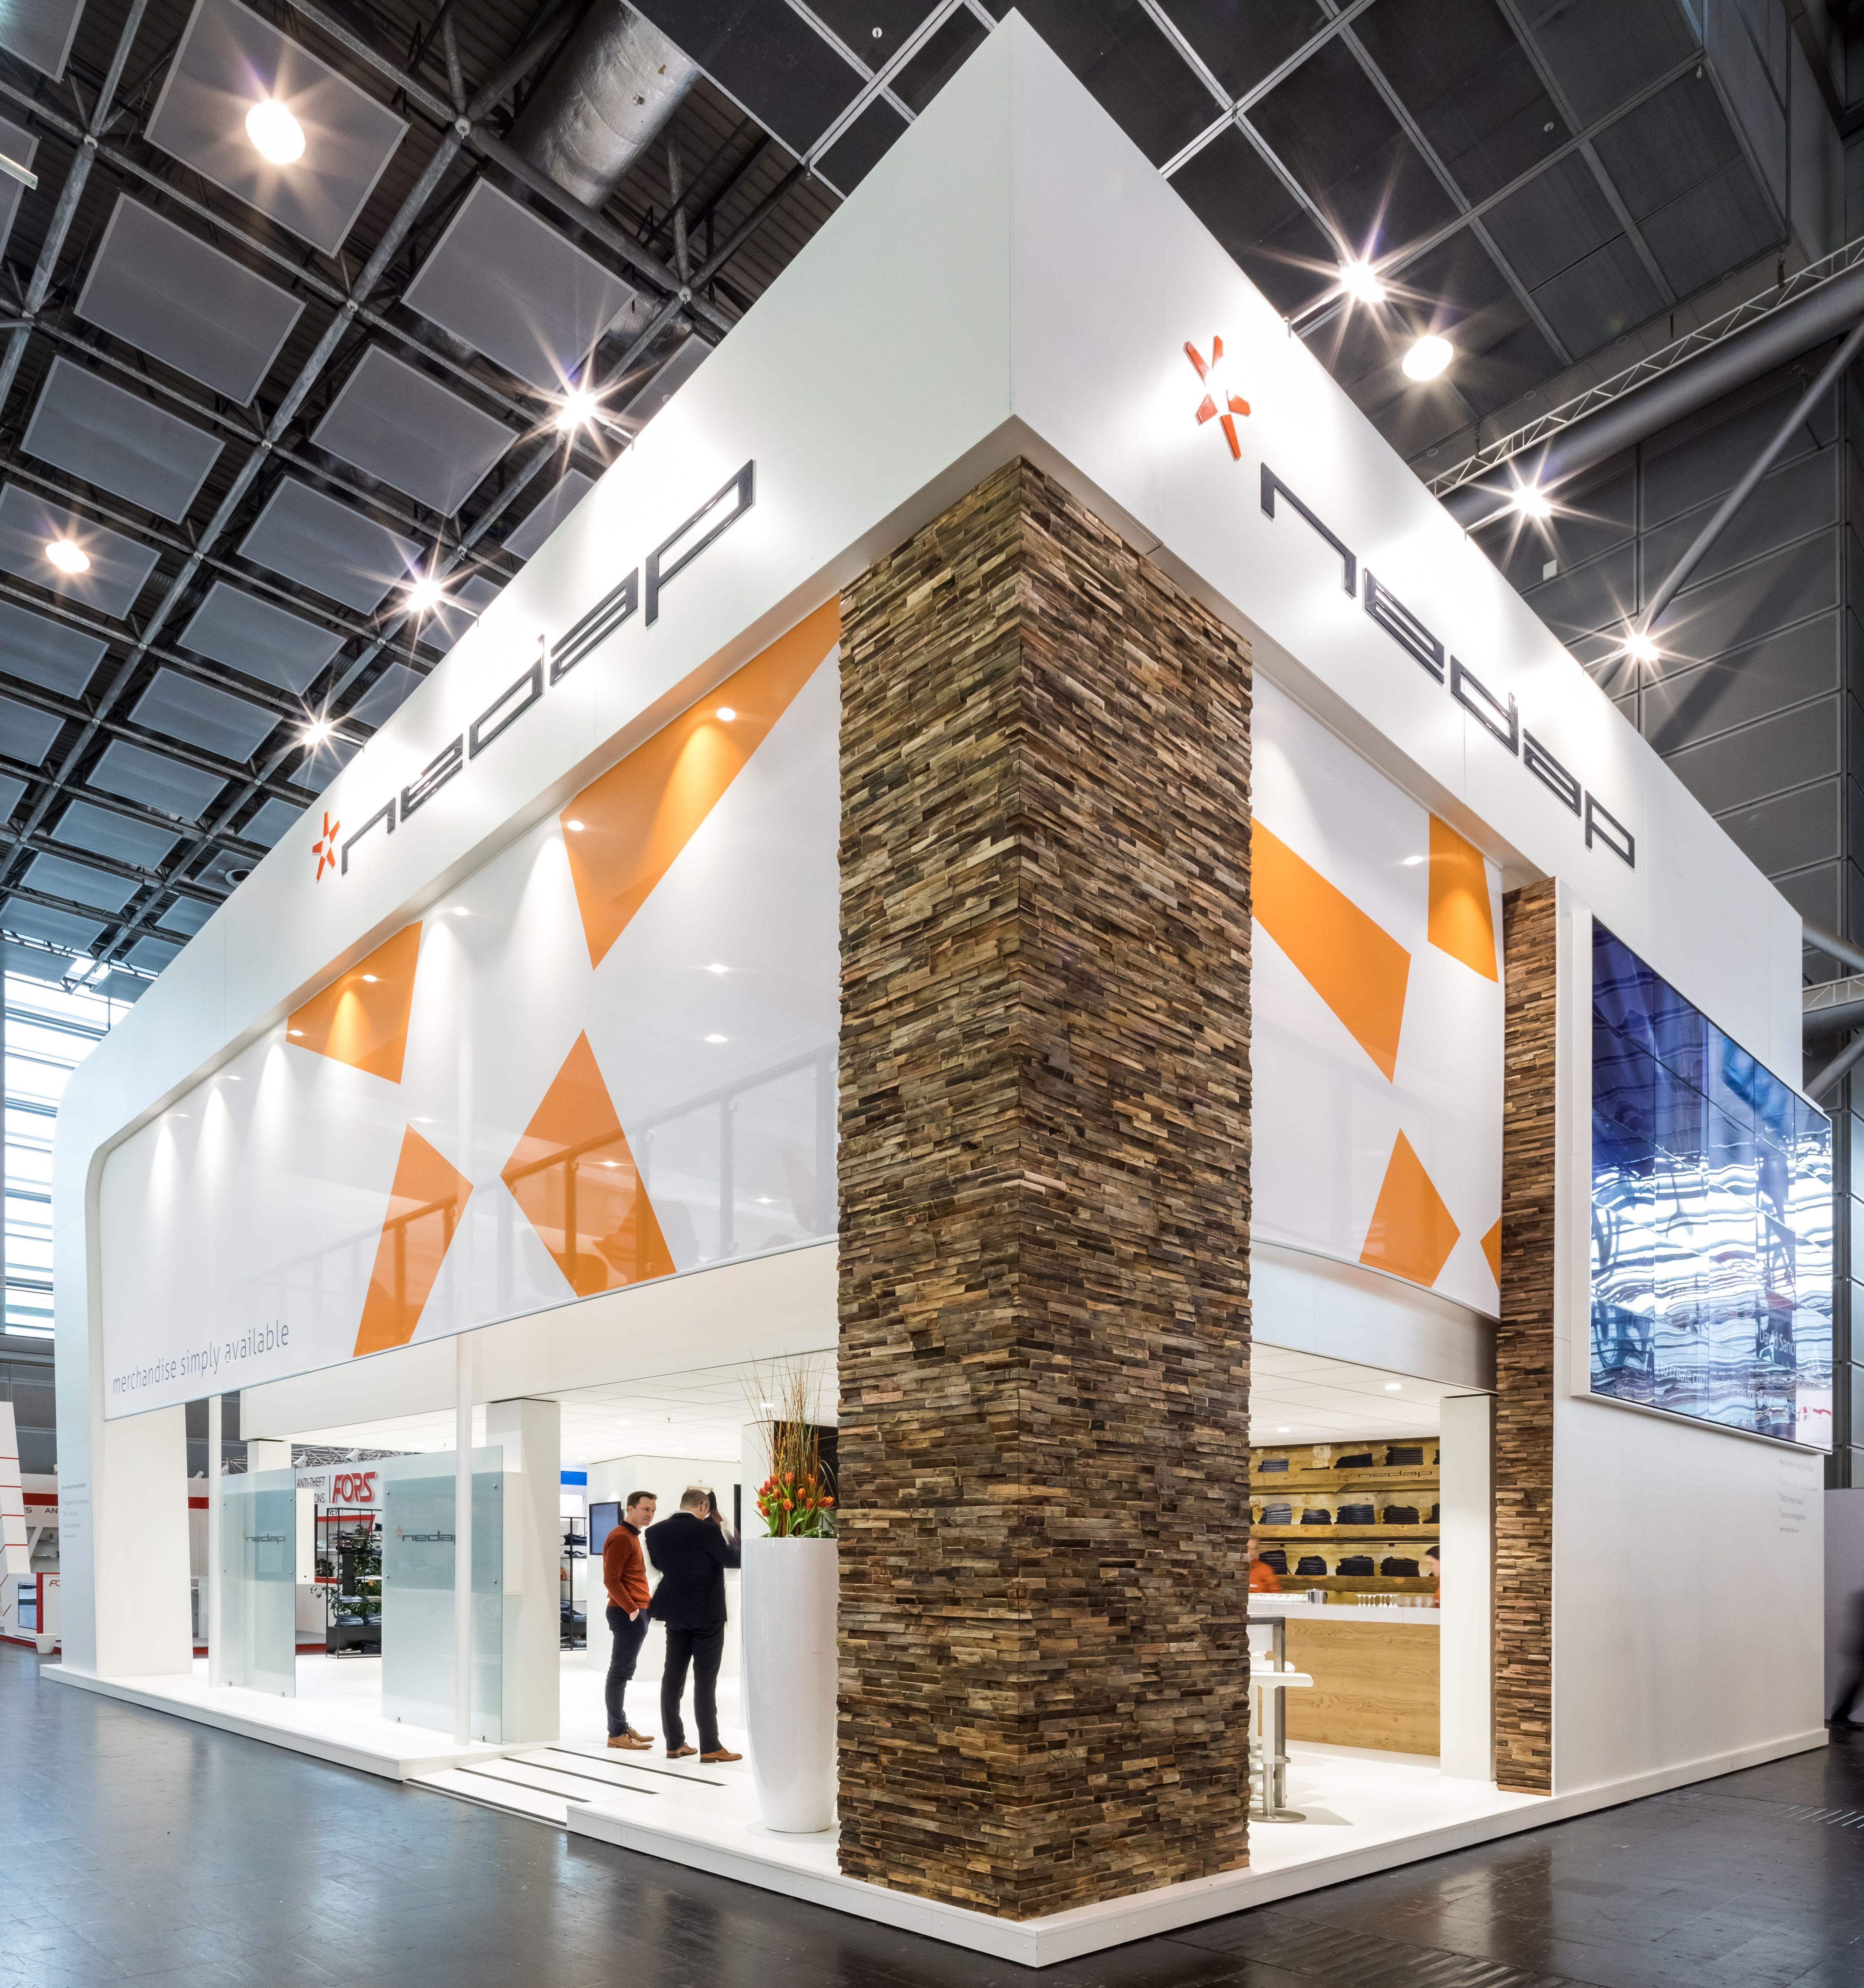 #exhibition #standbouw #stand for Nedap by Cialona Expo. #expo #exhibitionstand #exhibitiondesign #standdesign #showroom #experiencecenter #booth #center #standbuilding #standontwerp #fair #beurs #beursstand